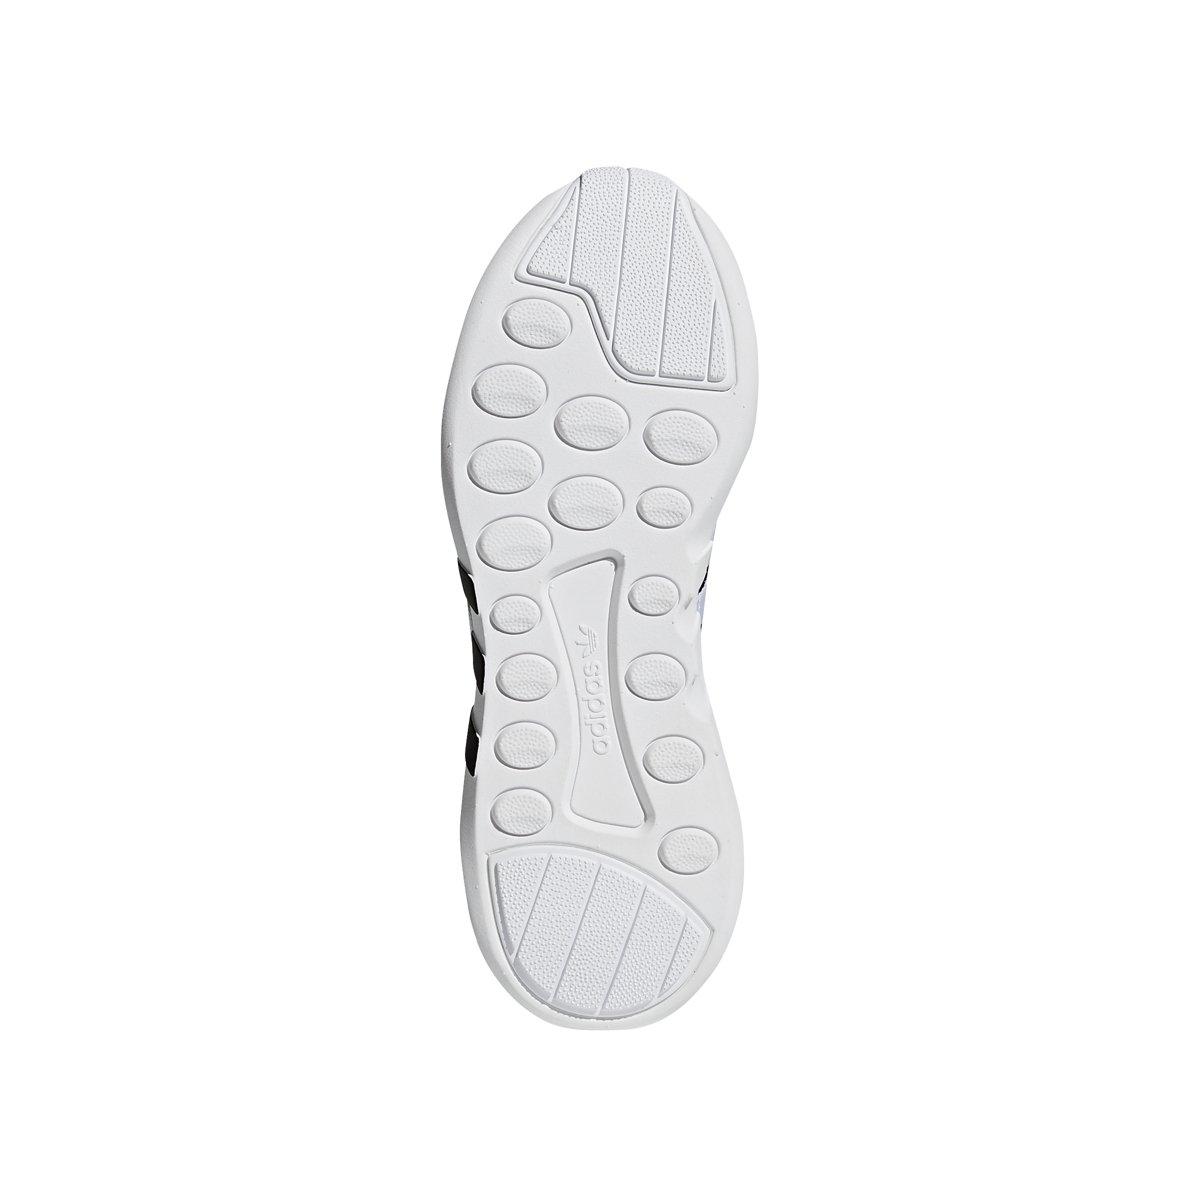 adidas Men's Eqt Support Adv Fashion Sneaker,black/white/black,7.5 M US